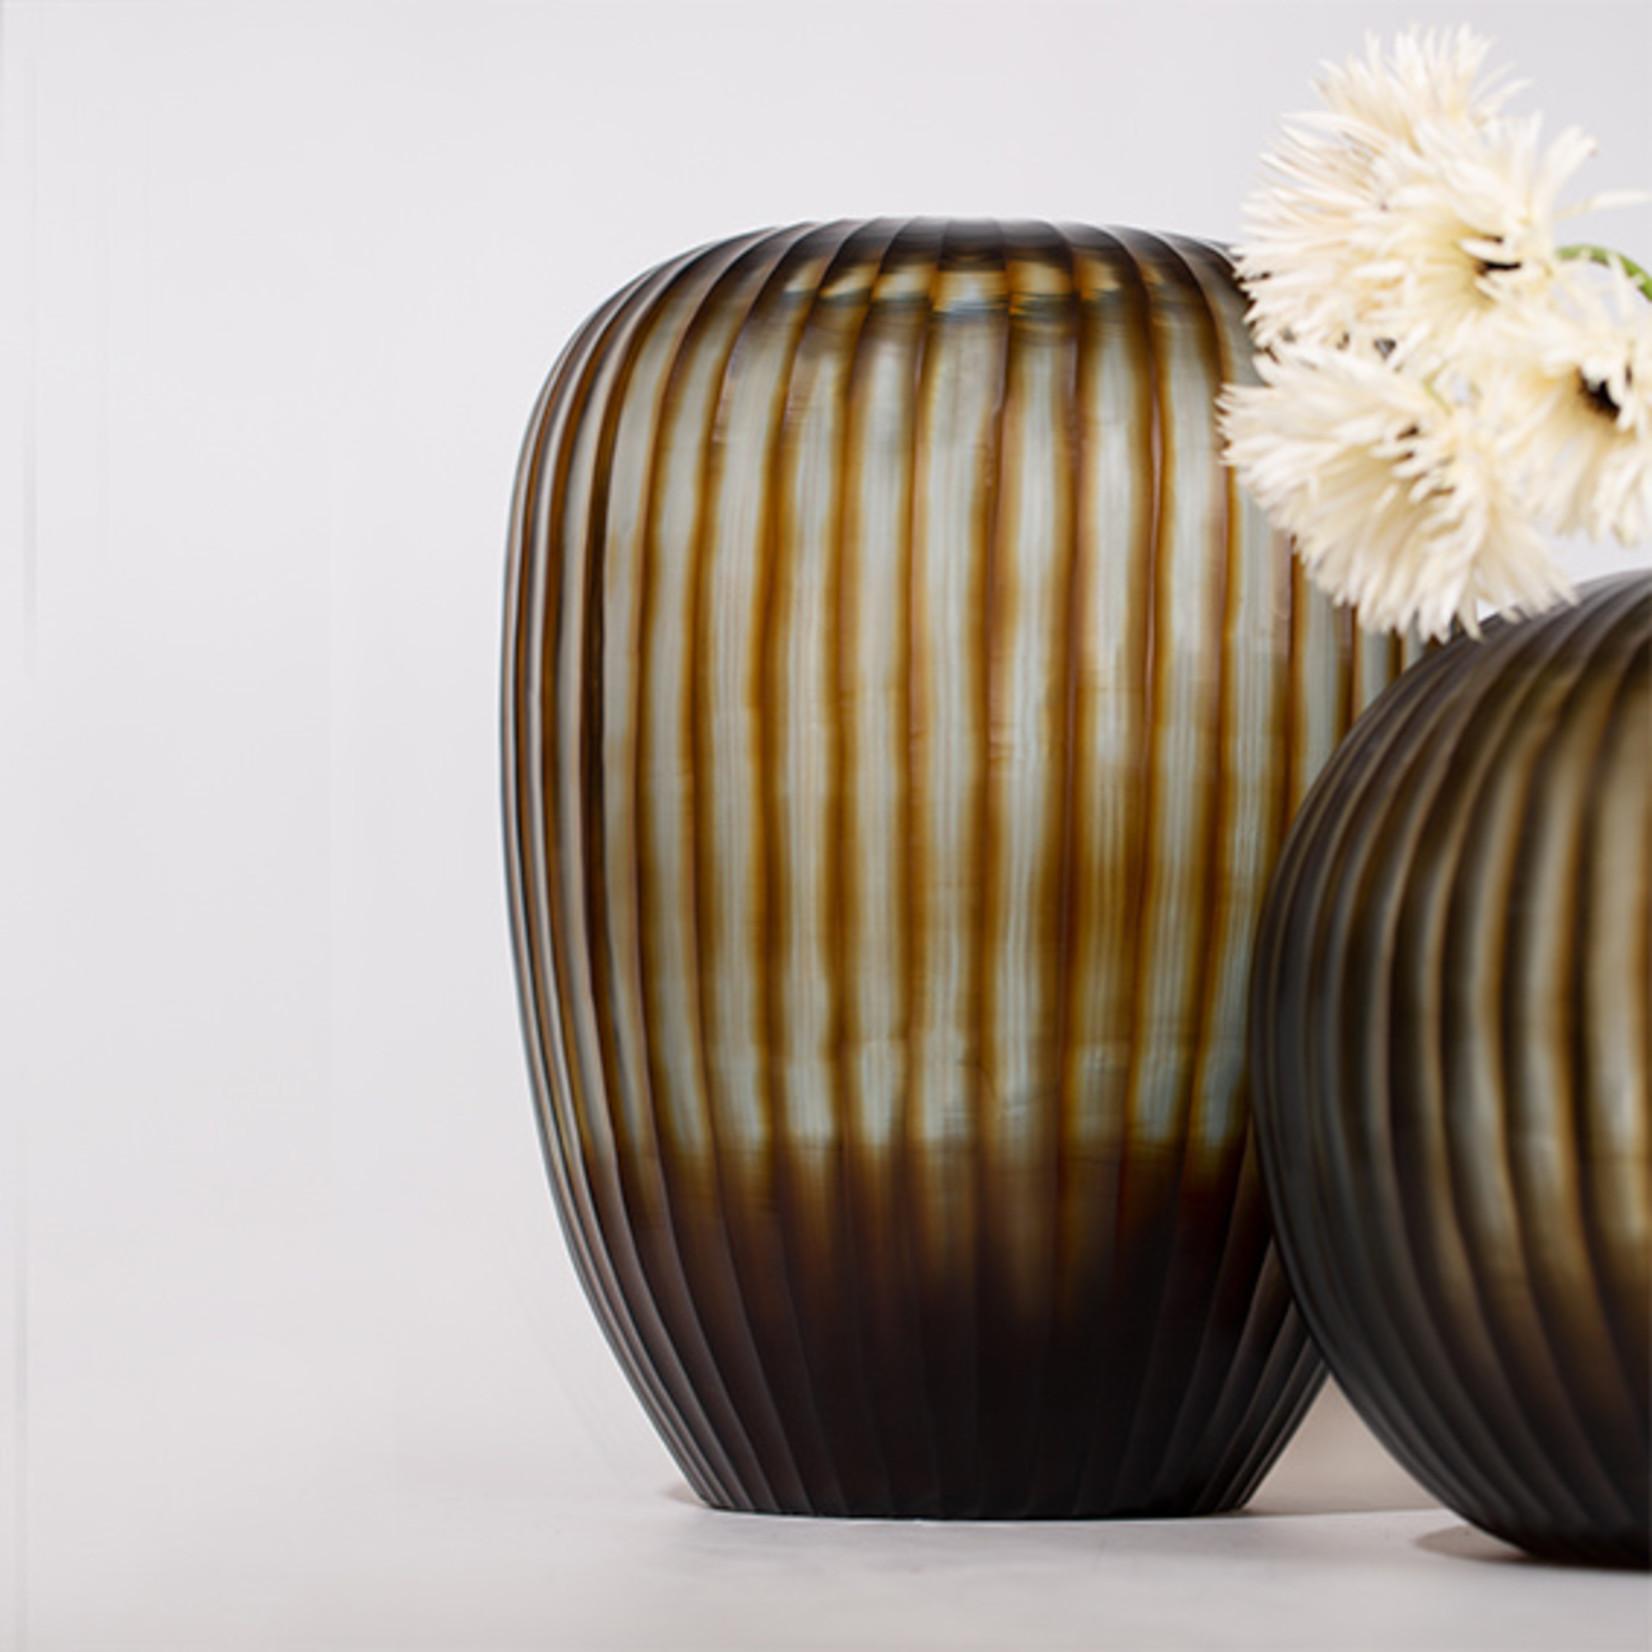 Guaxs Vase Gobi Tall | Indigo / Brown